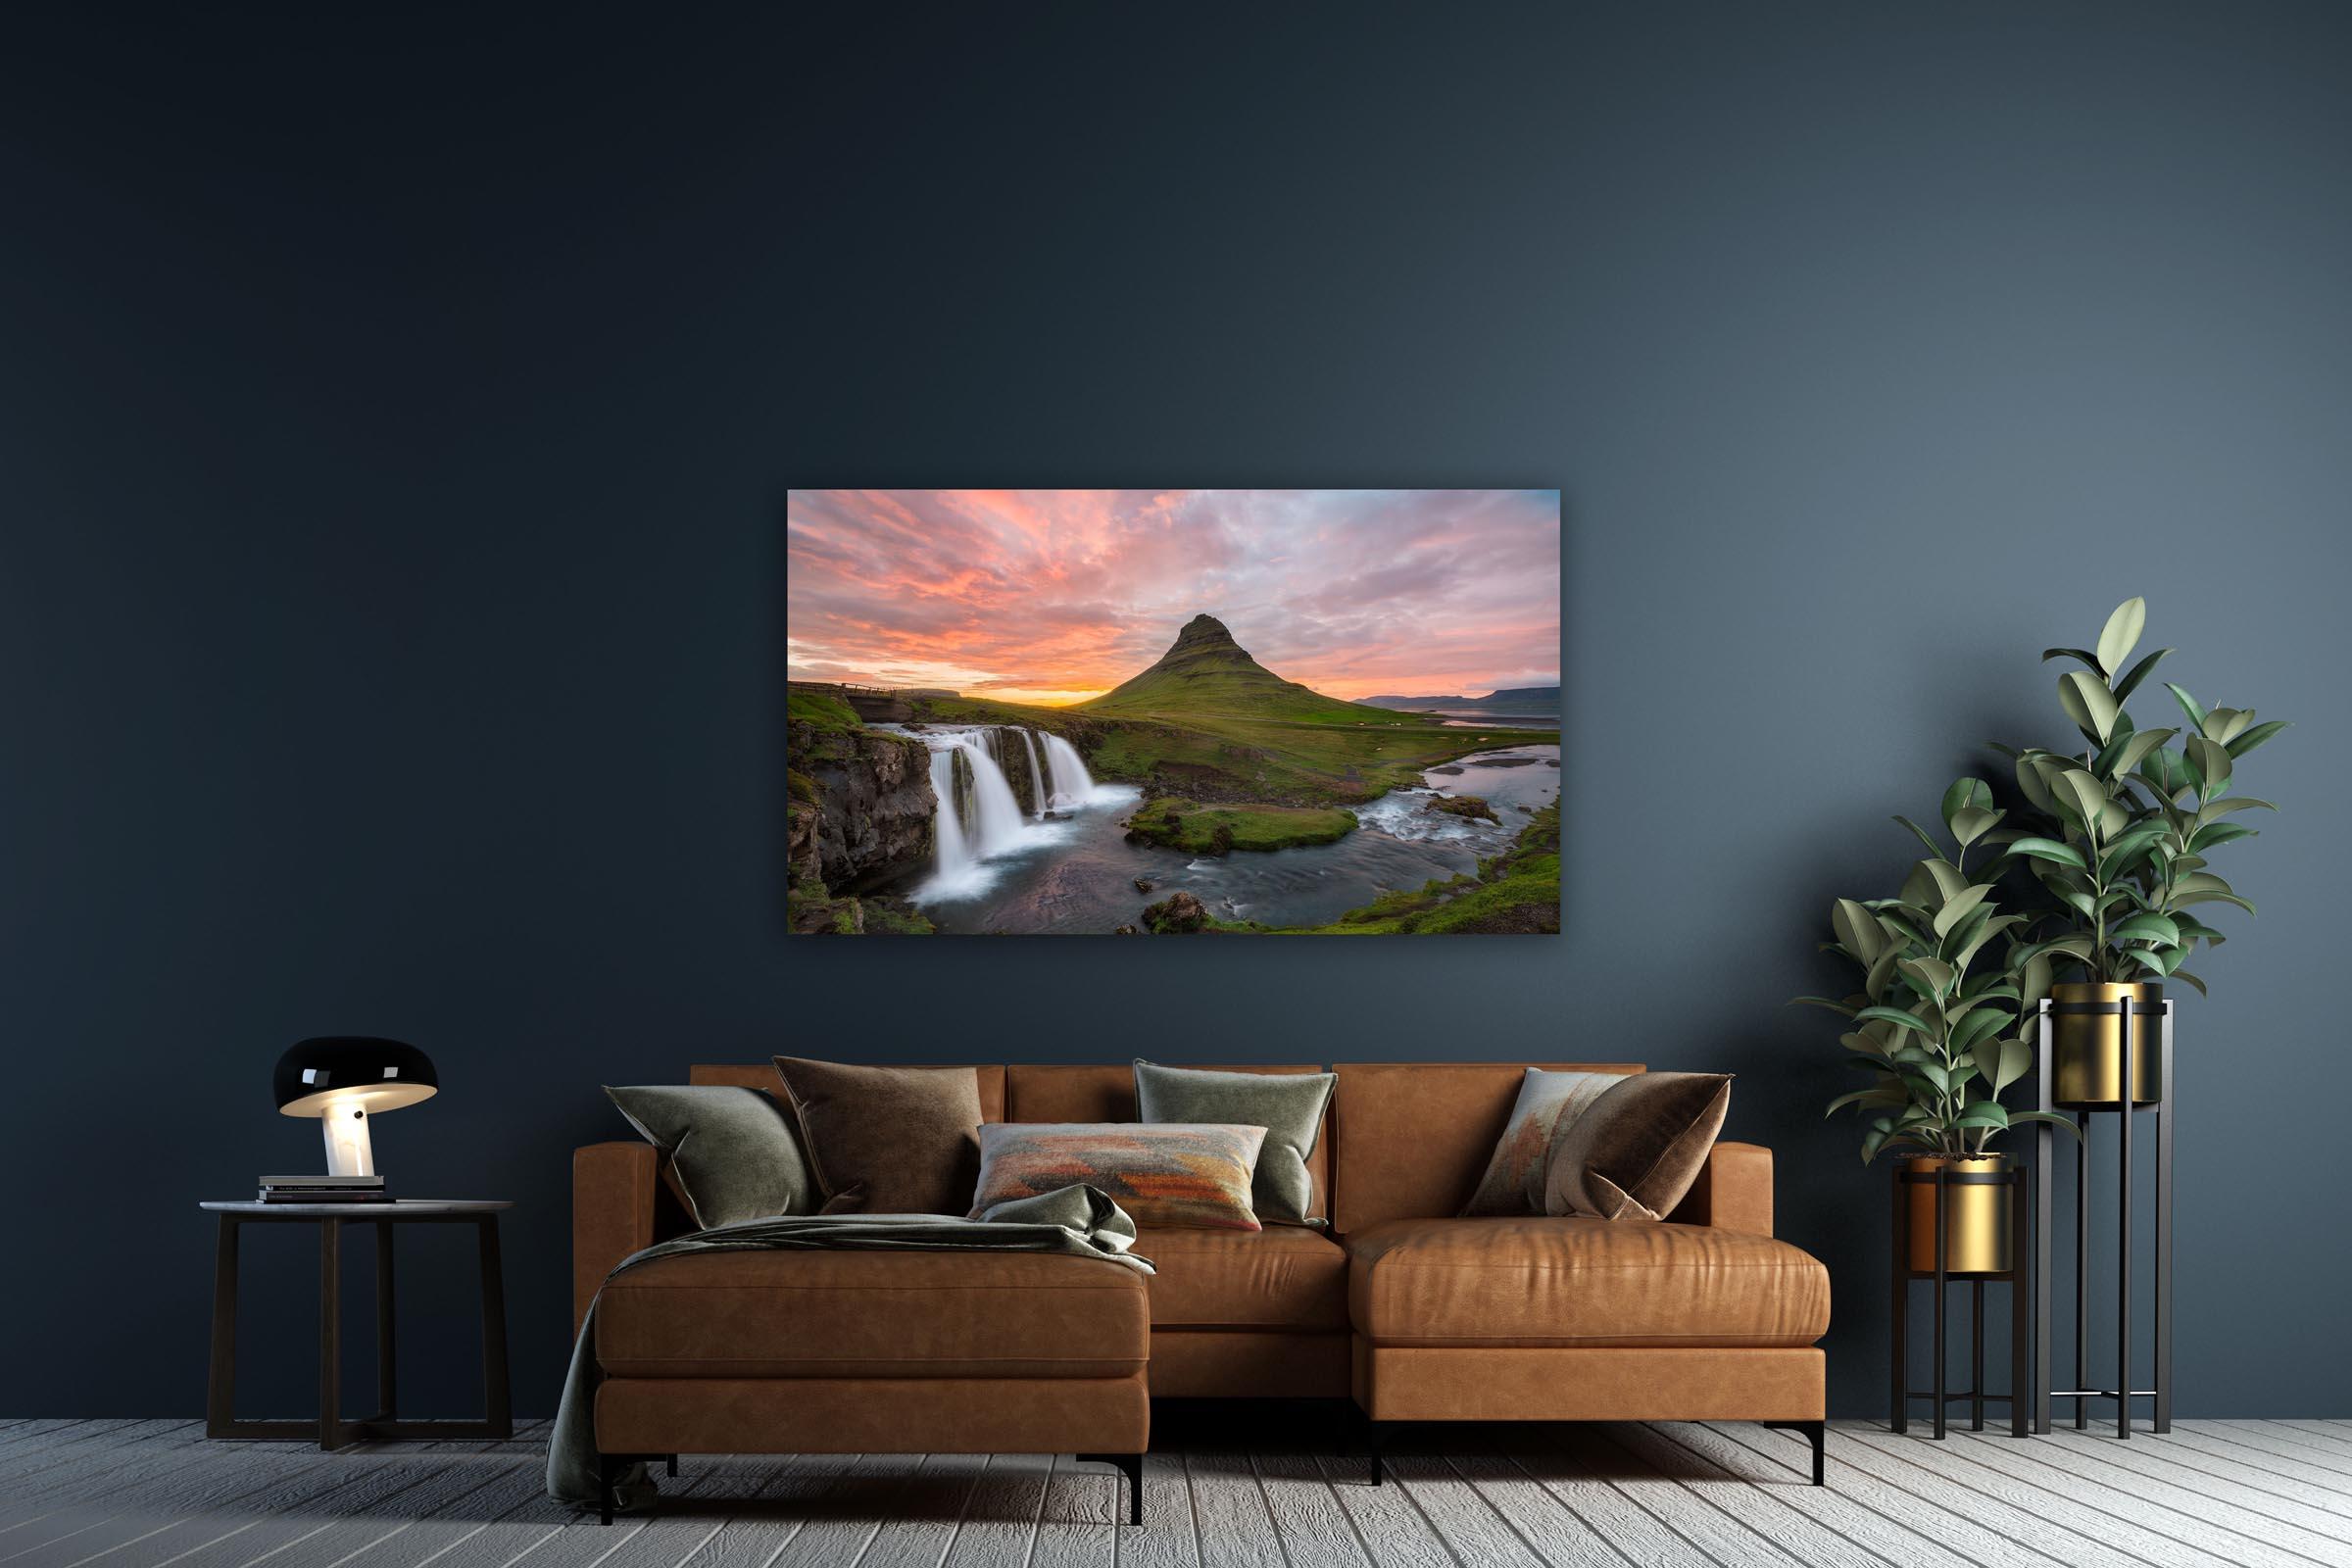 Wall art of Kirkjufell Mountain in Snæfellsnes, Iceland by Brent Goldman Photography